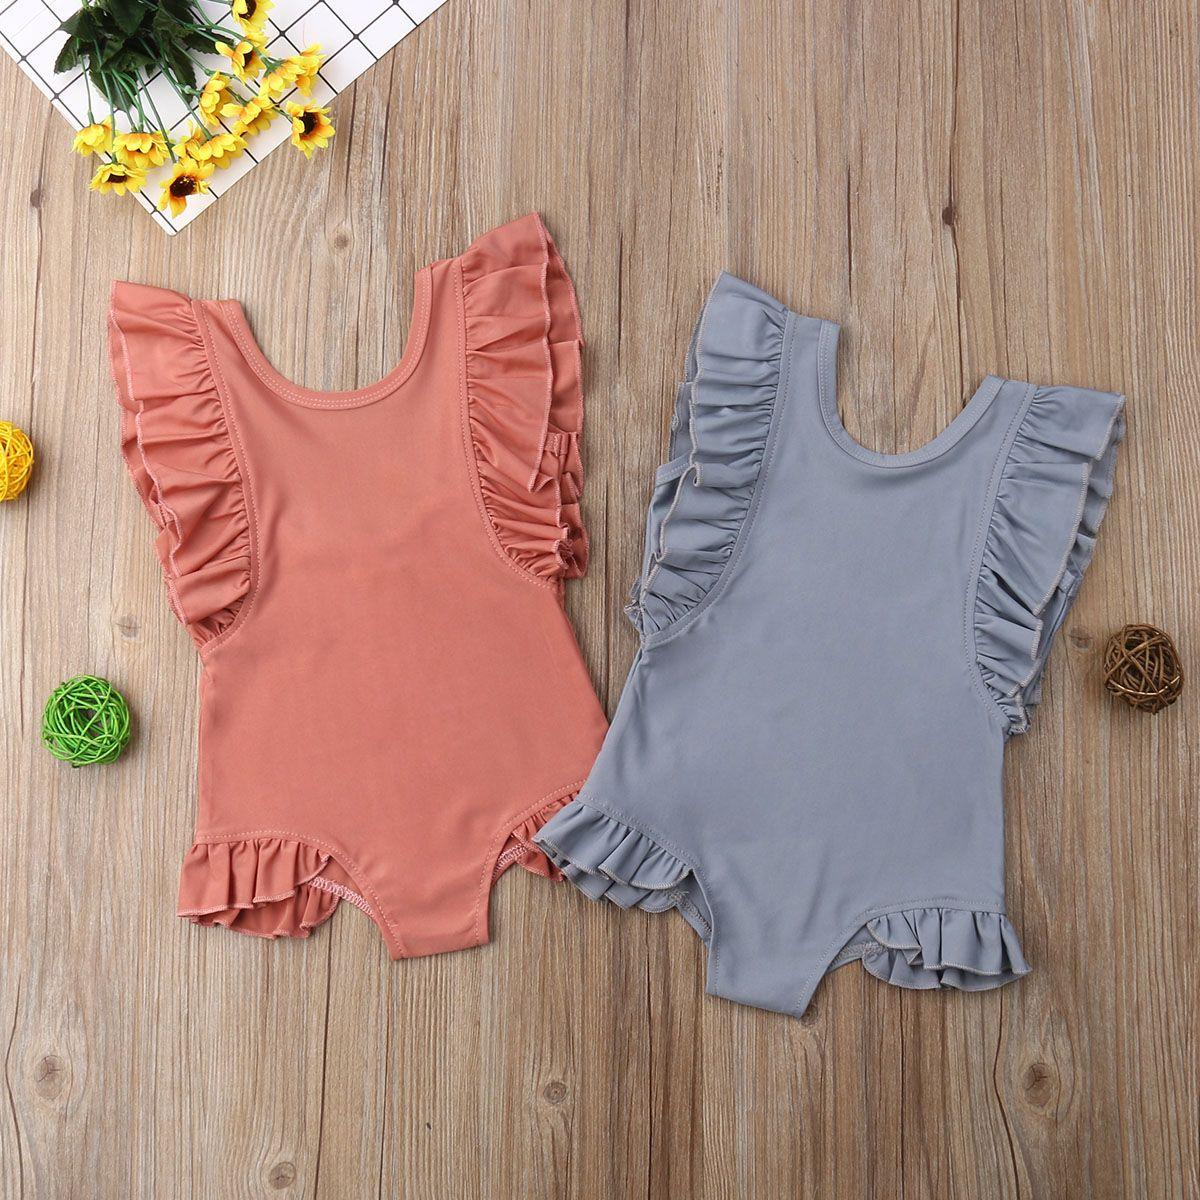 2020 New Toddler Kids Baby Girl Ruffles Sleeveless Swimwear Summer Solid One Piece Swimsuit Bathing Suit Beachwear for 1-6Years